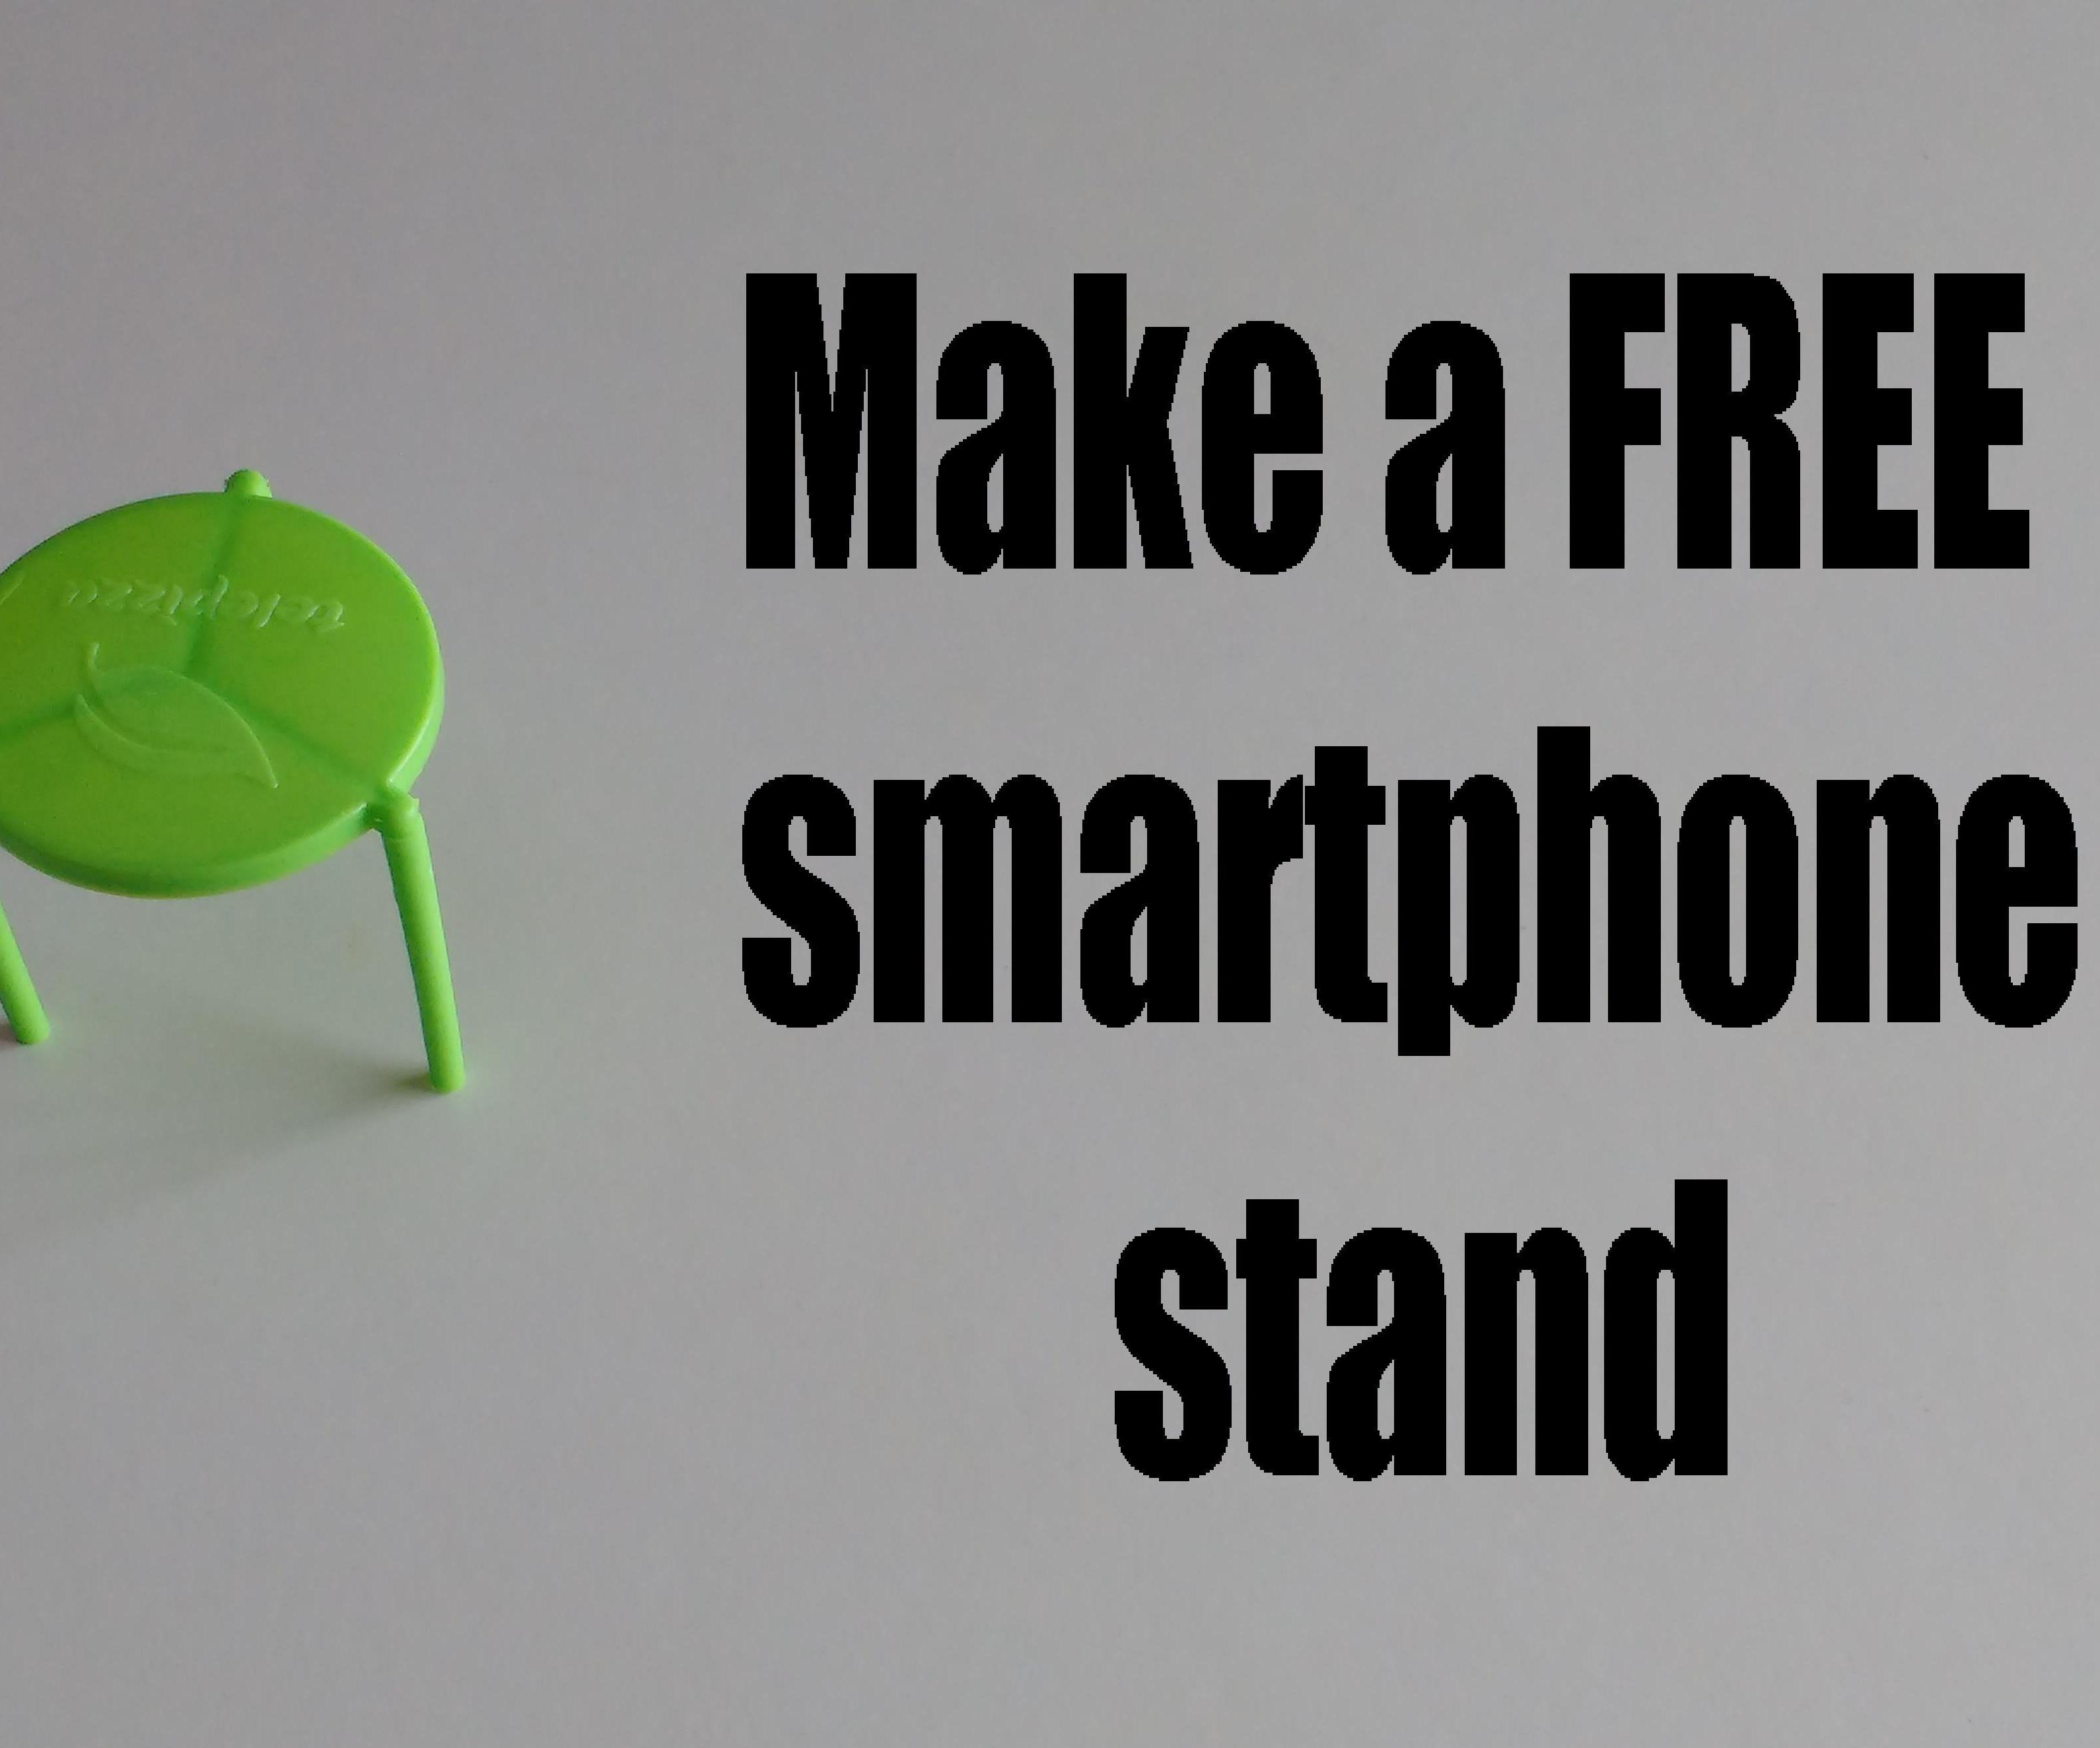 Make a FREE smartphone stand